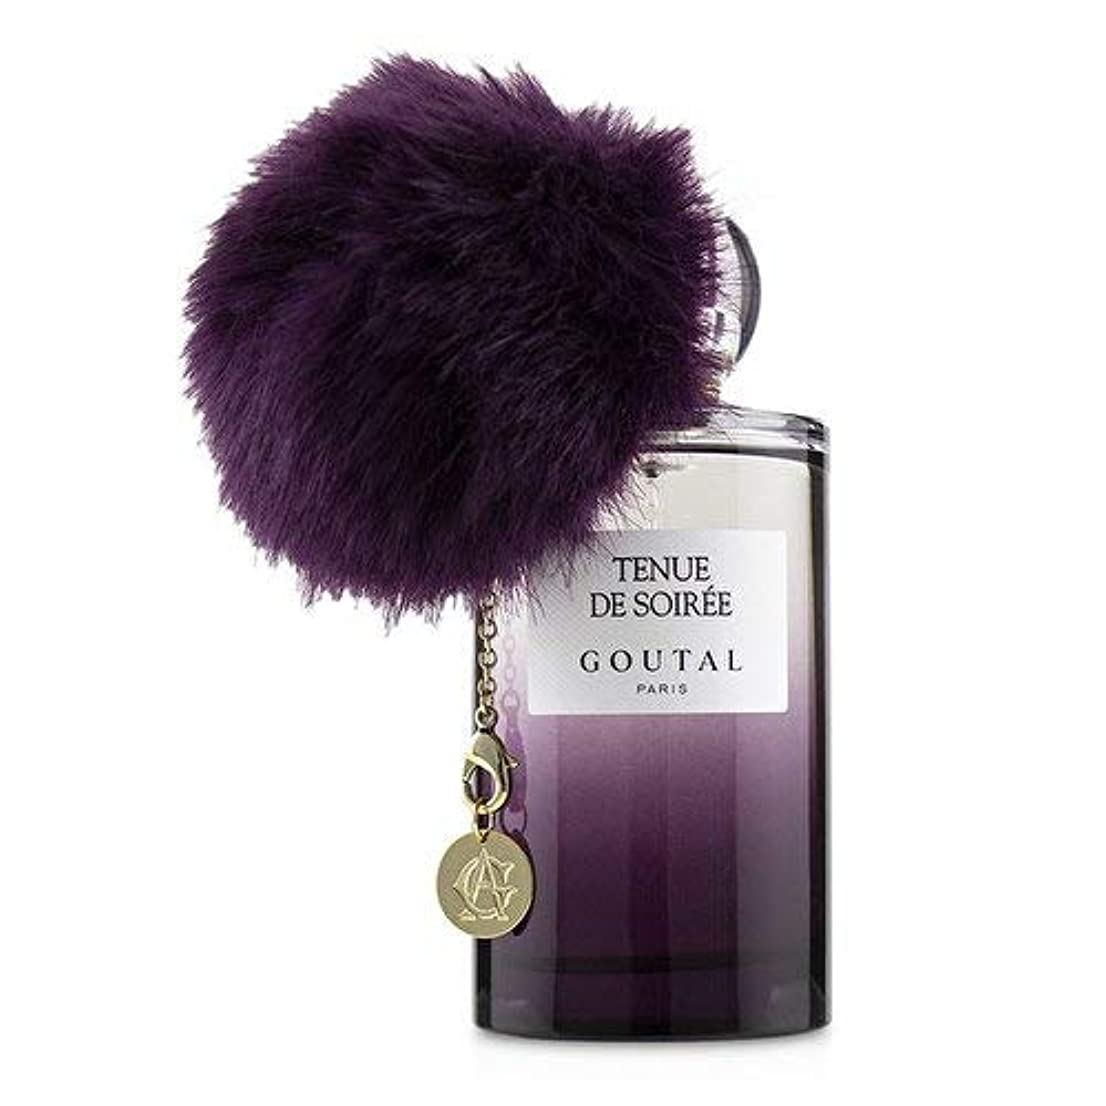 作曲する議題帽子Goutal (Annick Goutal) Tenue De Soiree Eau De Parfum Spray 100ml/3.4oz並行輸入品